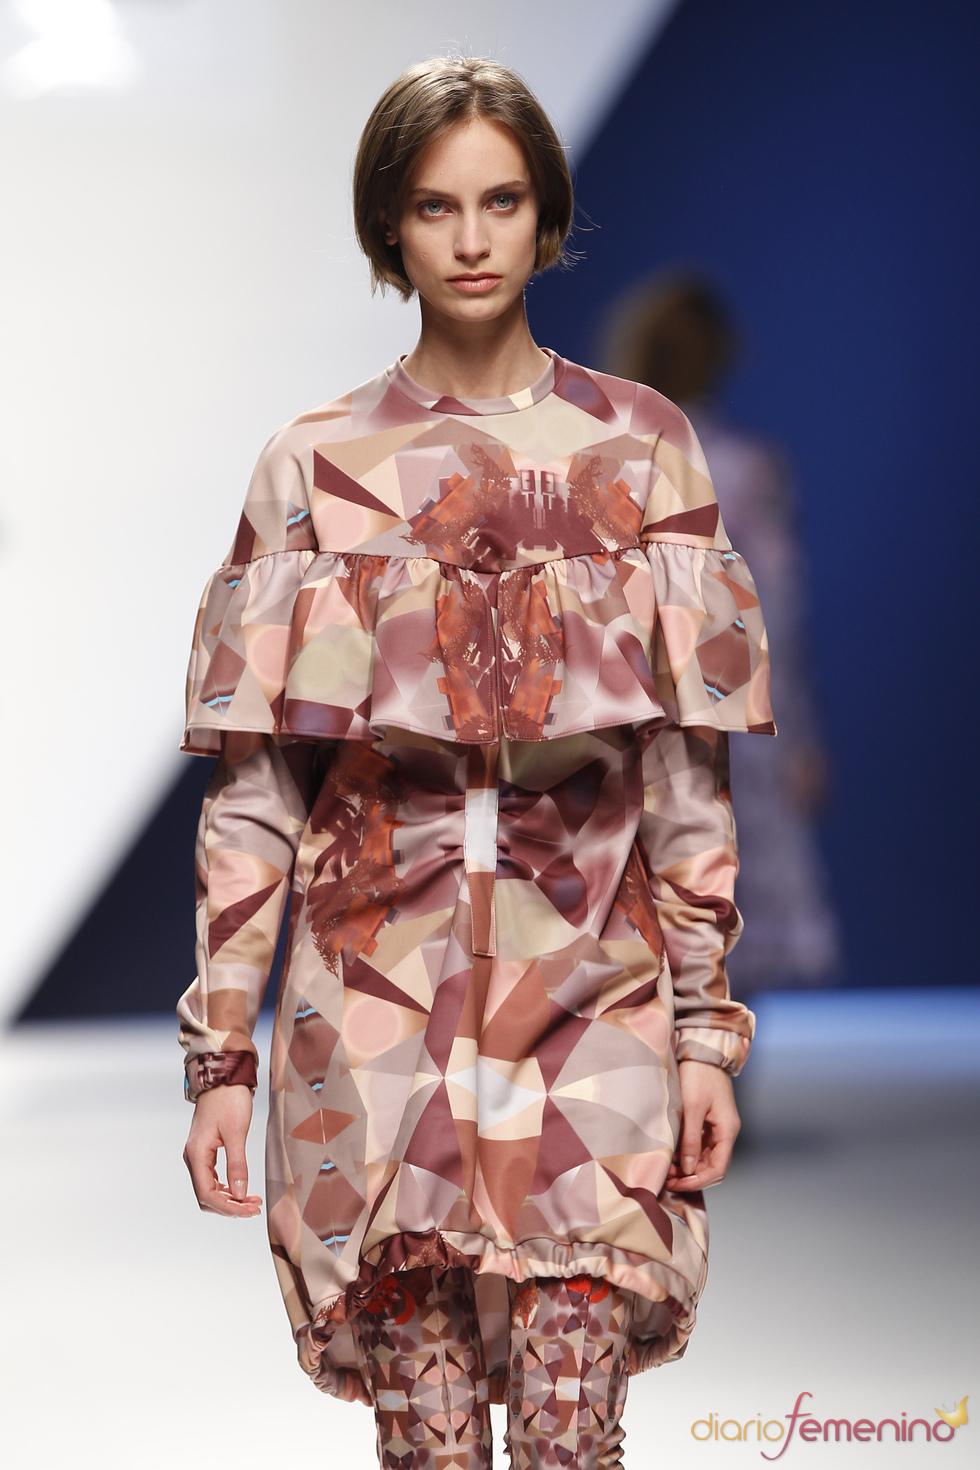 Moda Femenina - Solitas - cibeles madrid Fashion Week 2010